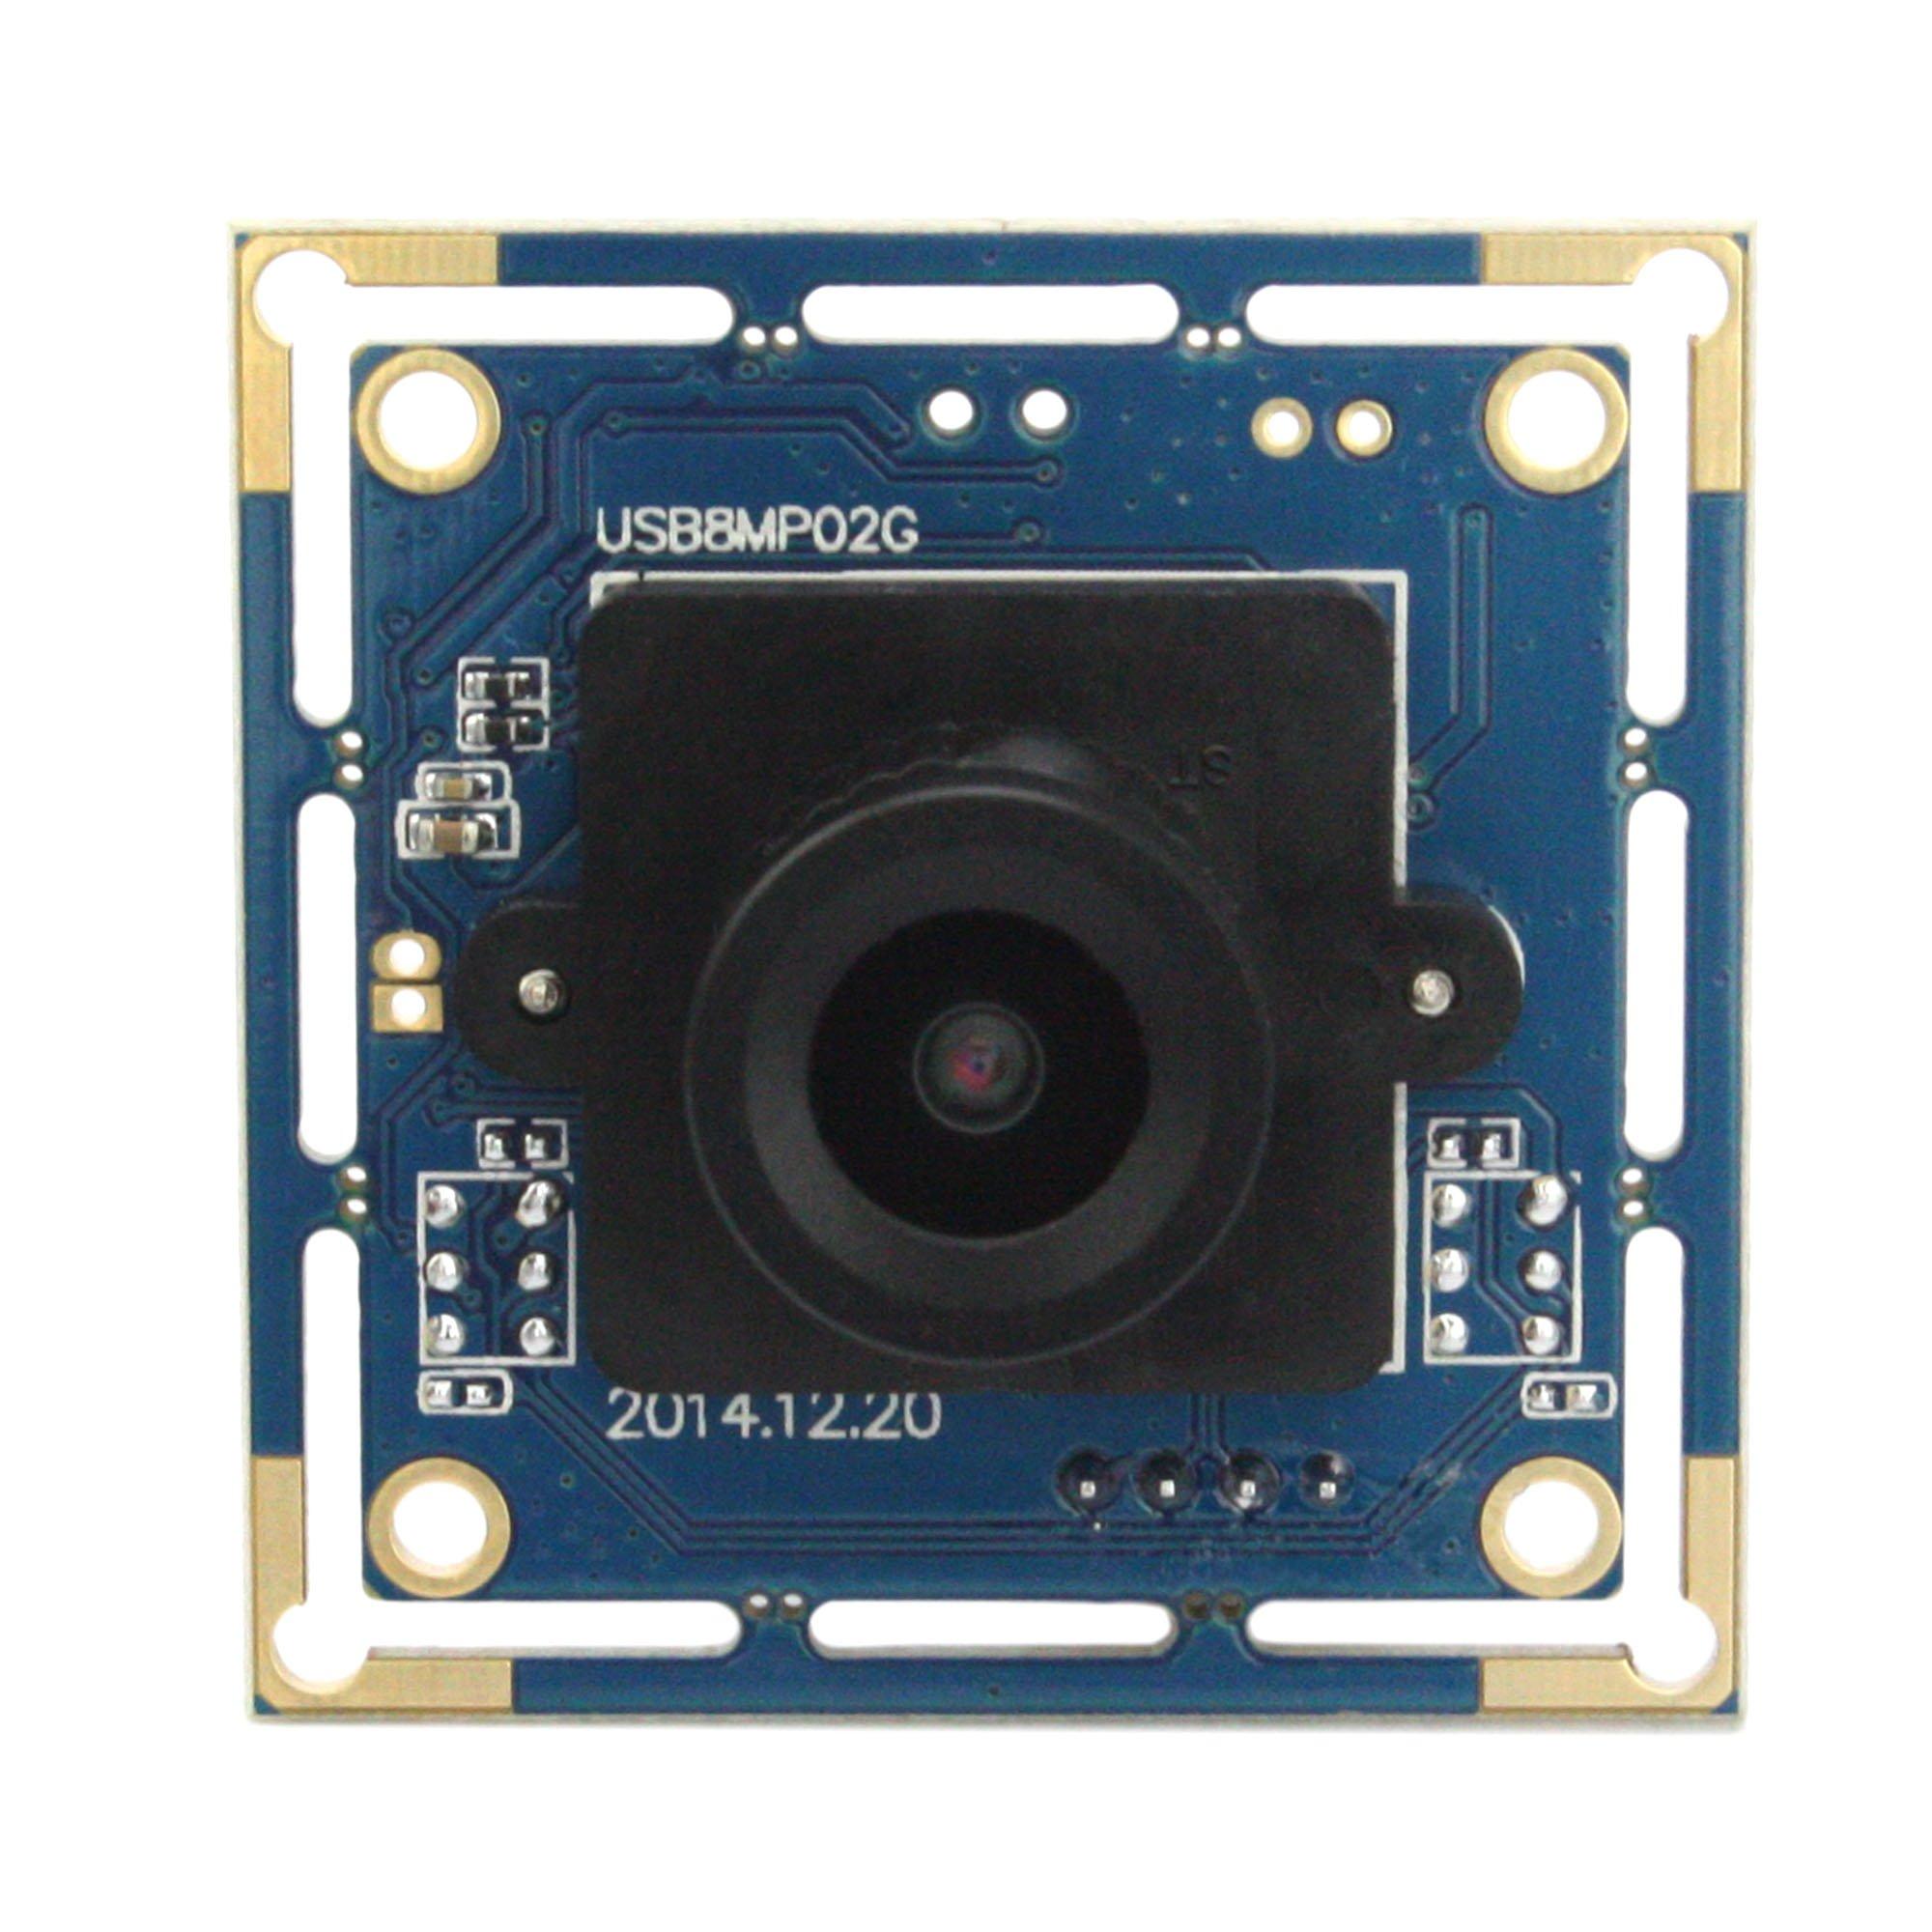 ELP 8 Megapixel HD Webcam Camera Module adopt Sony IMX179 sensor with 2.1mm wide angle lens